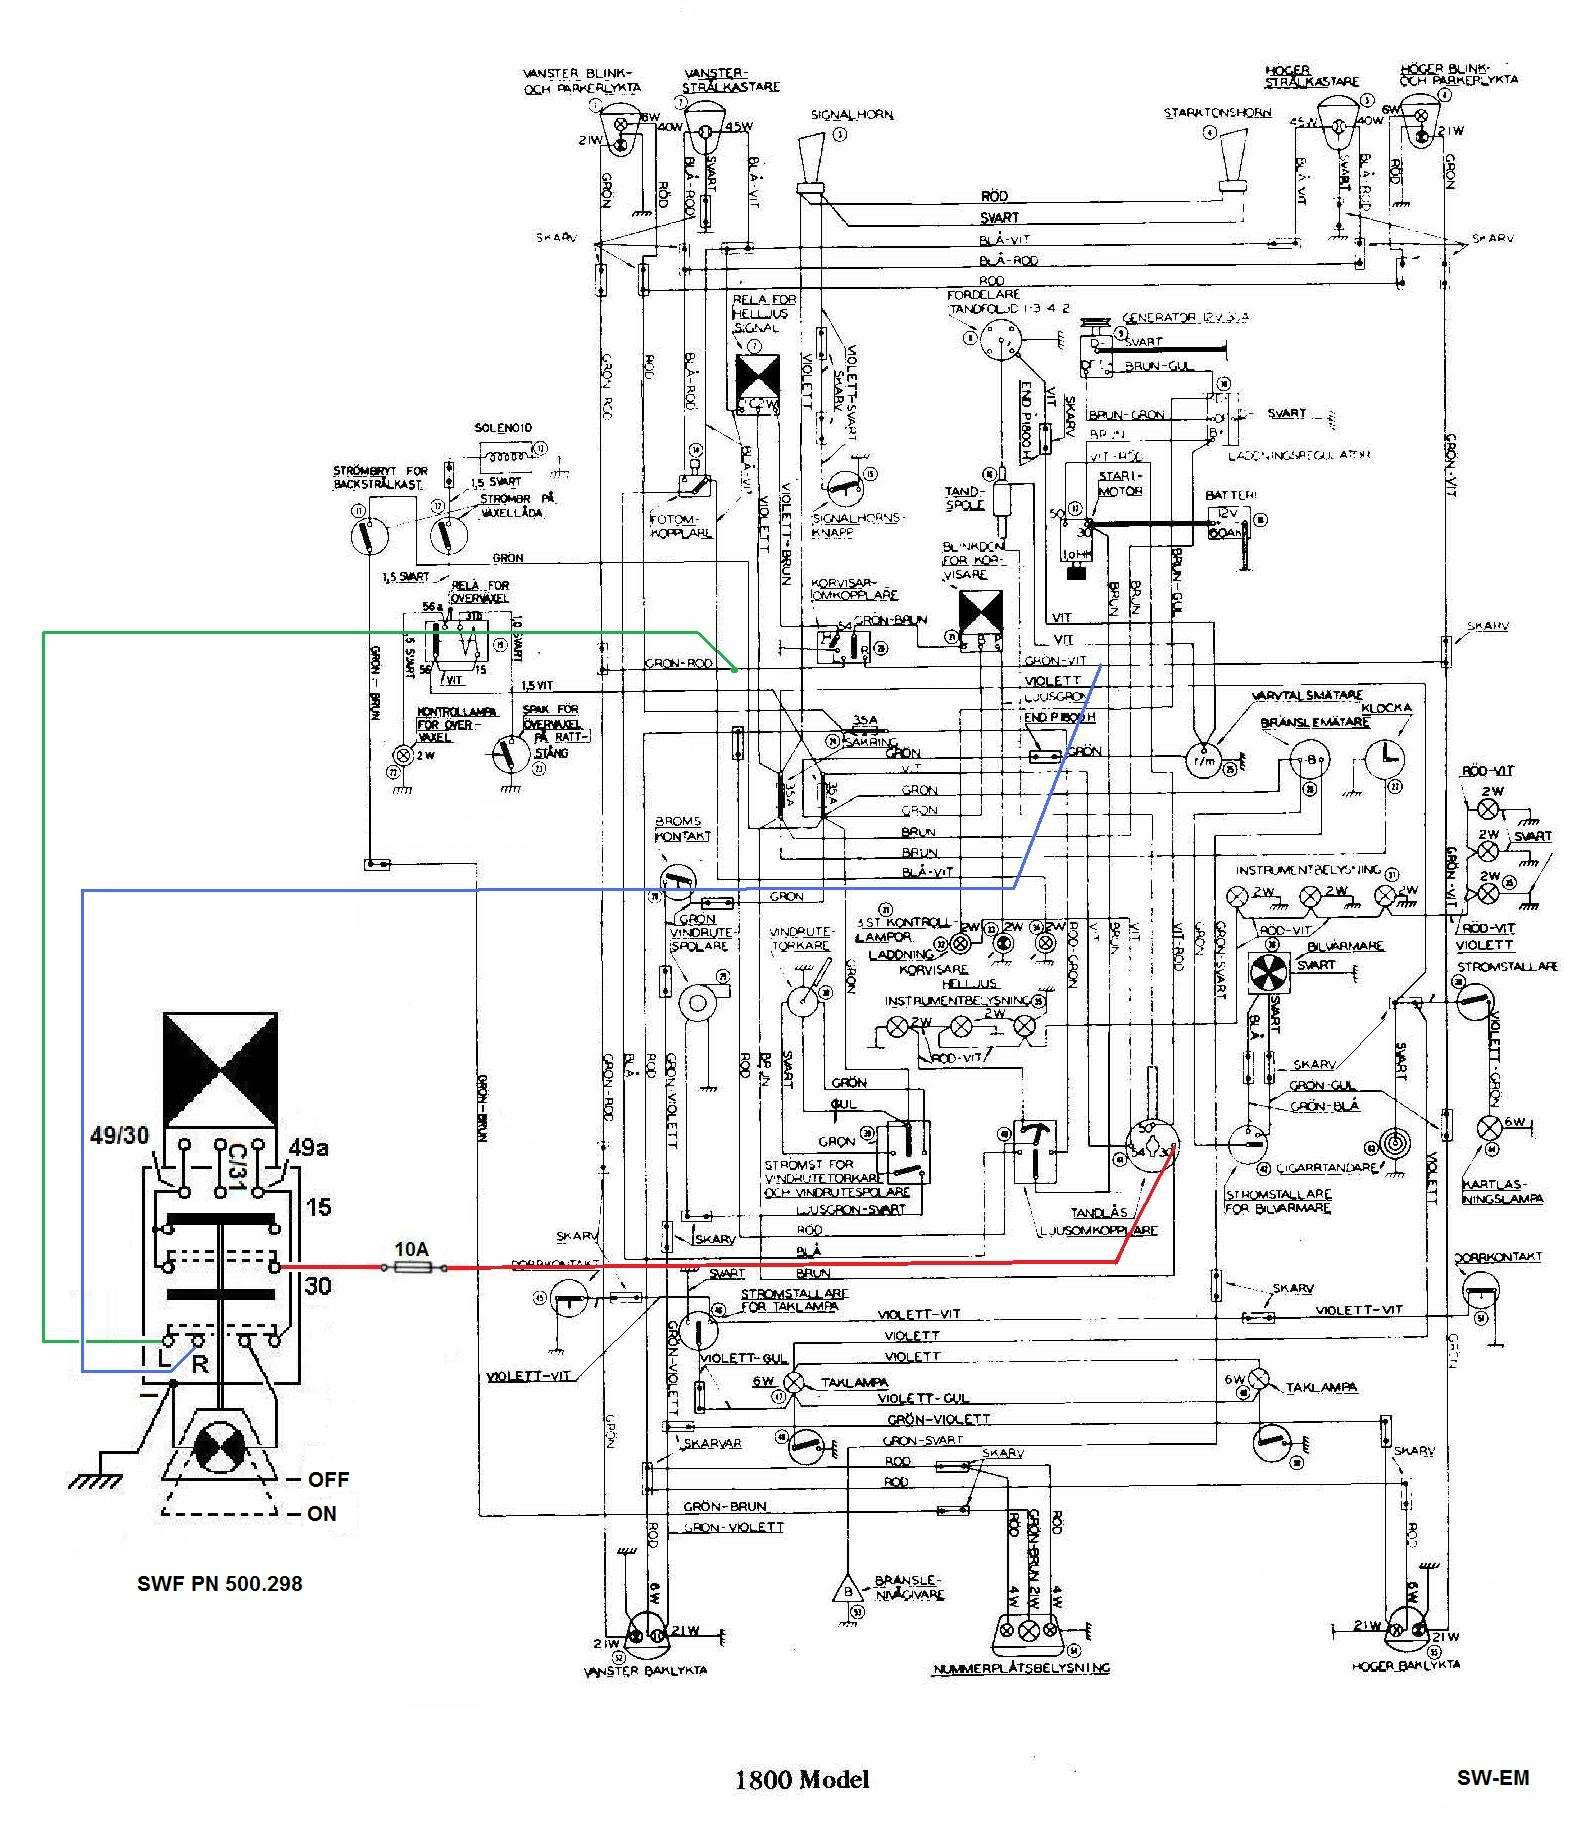 wiring diagram 3 way switch beautiful swf wiring diagram [ 1596 x 1840 Pixel ]